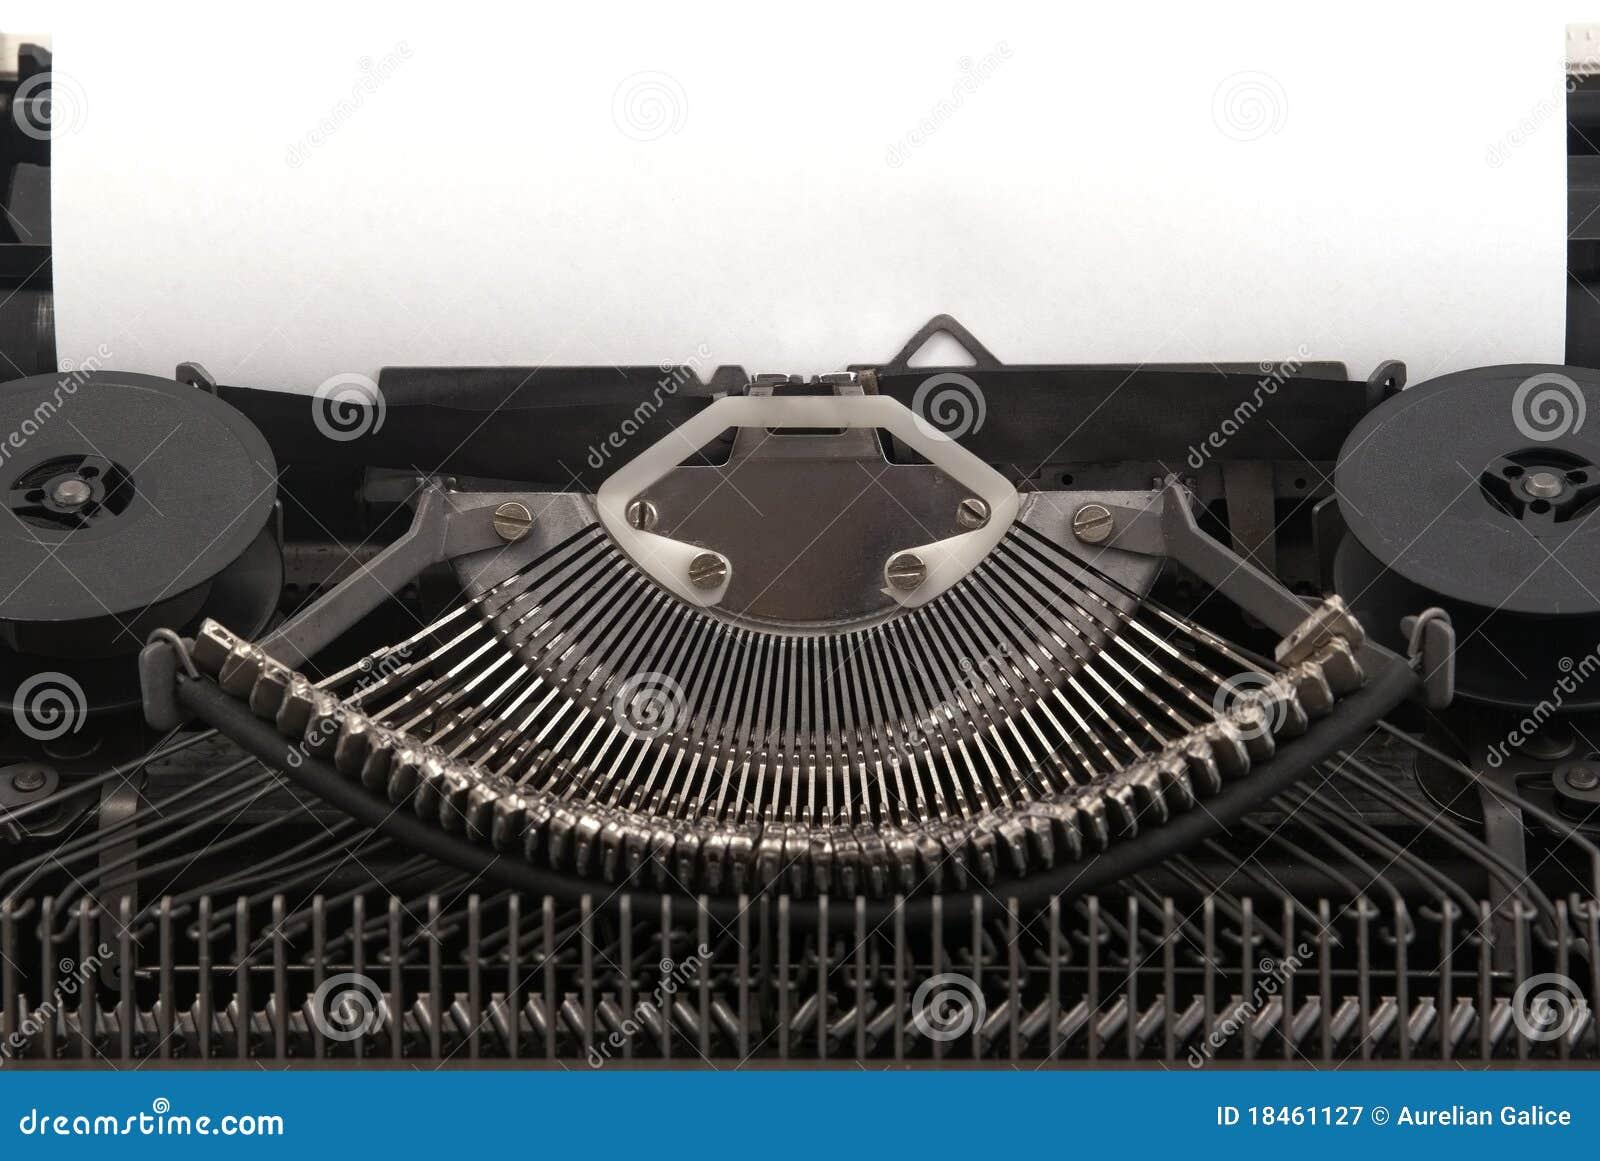 Old Typewriter with blank  Vintage Typewriter Paper Photography